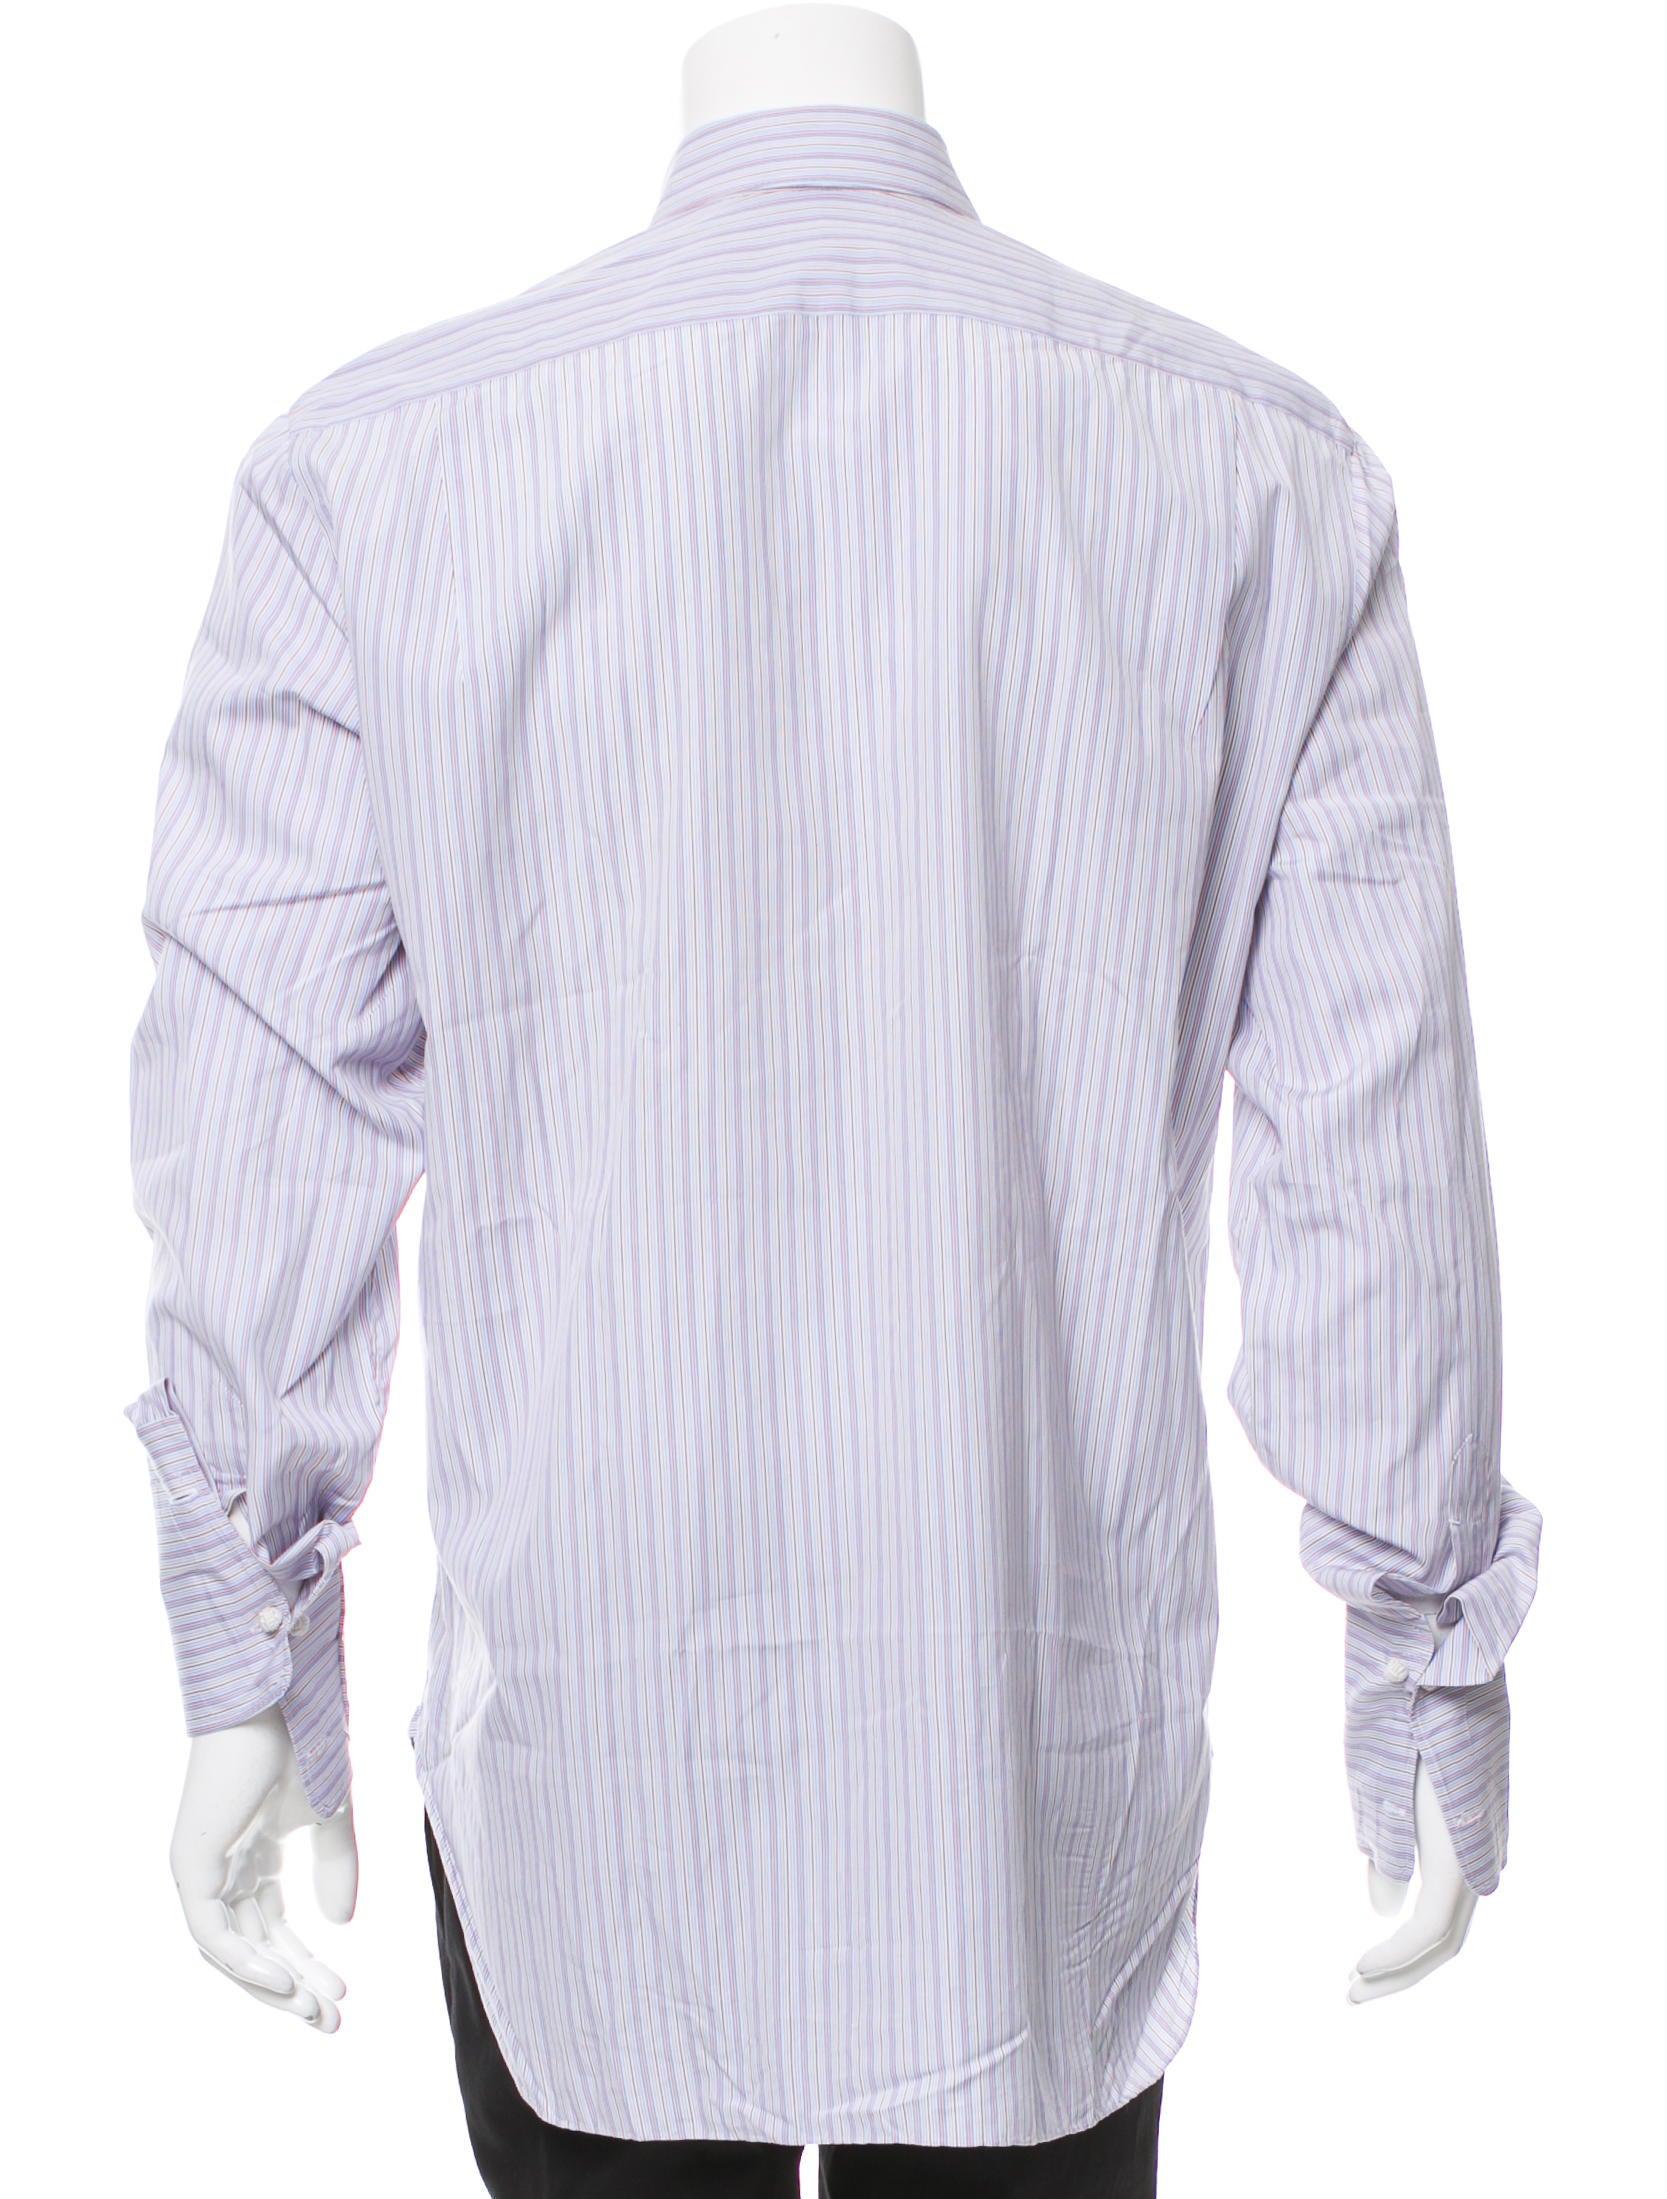 Kiton striped button up shirt clothing kit21572 the for Striped button up shirt mens